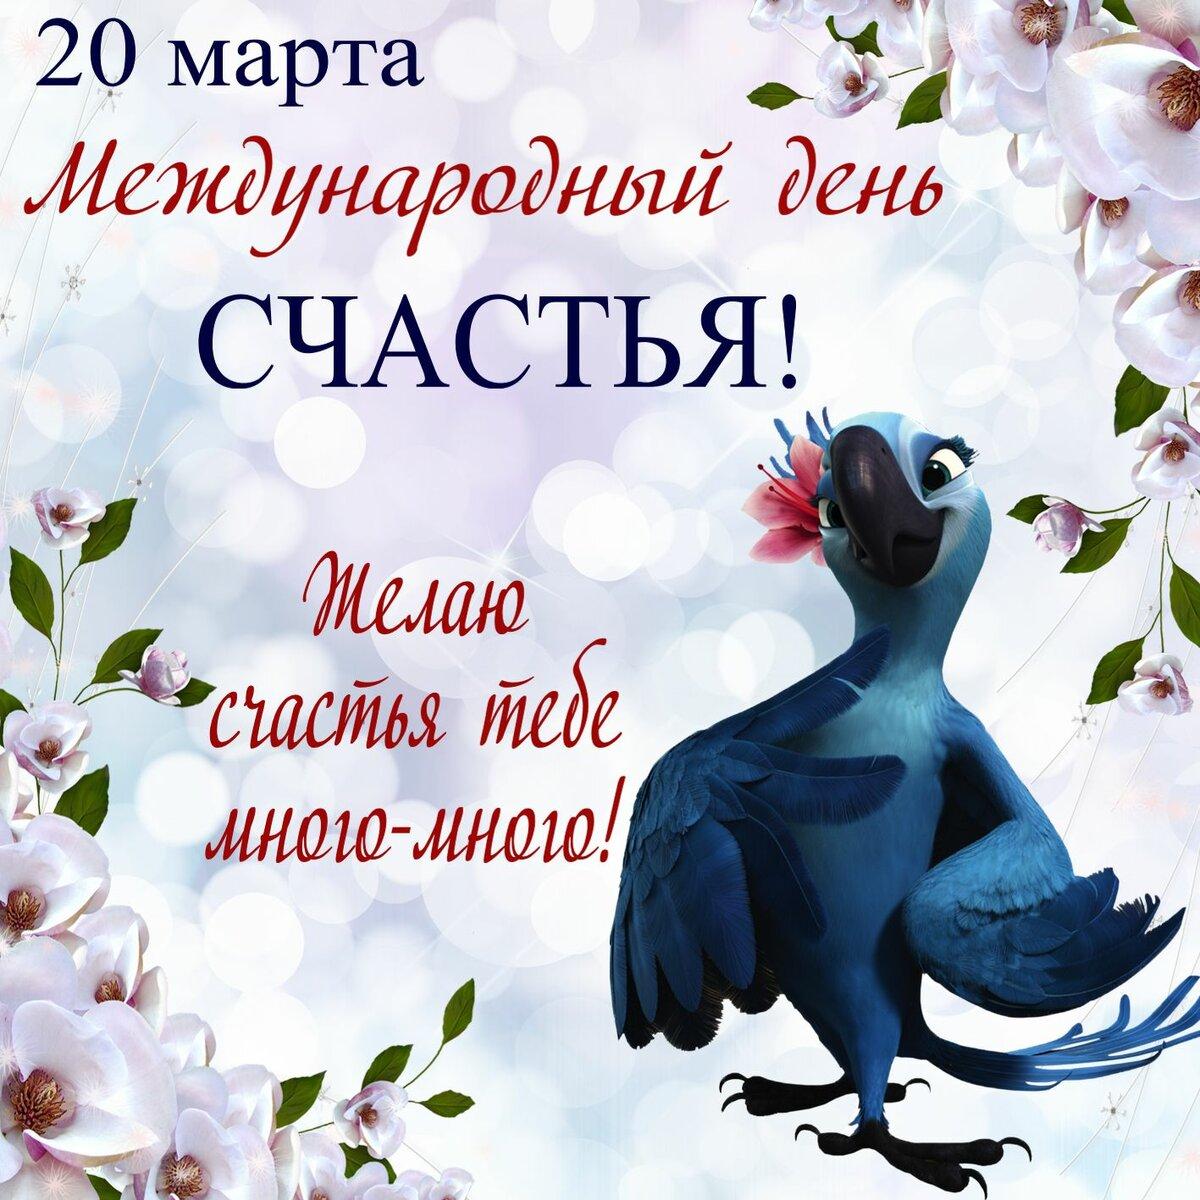 открытки праздники сегодня в россии съемки, героями